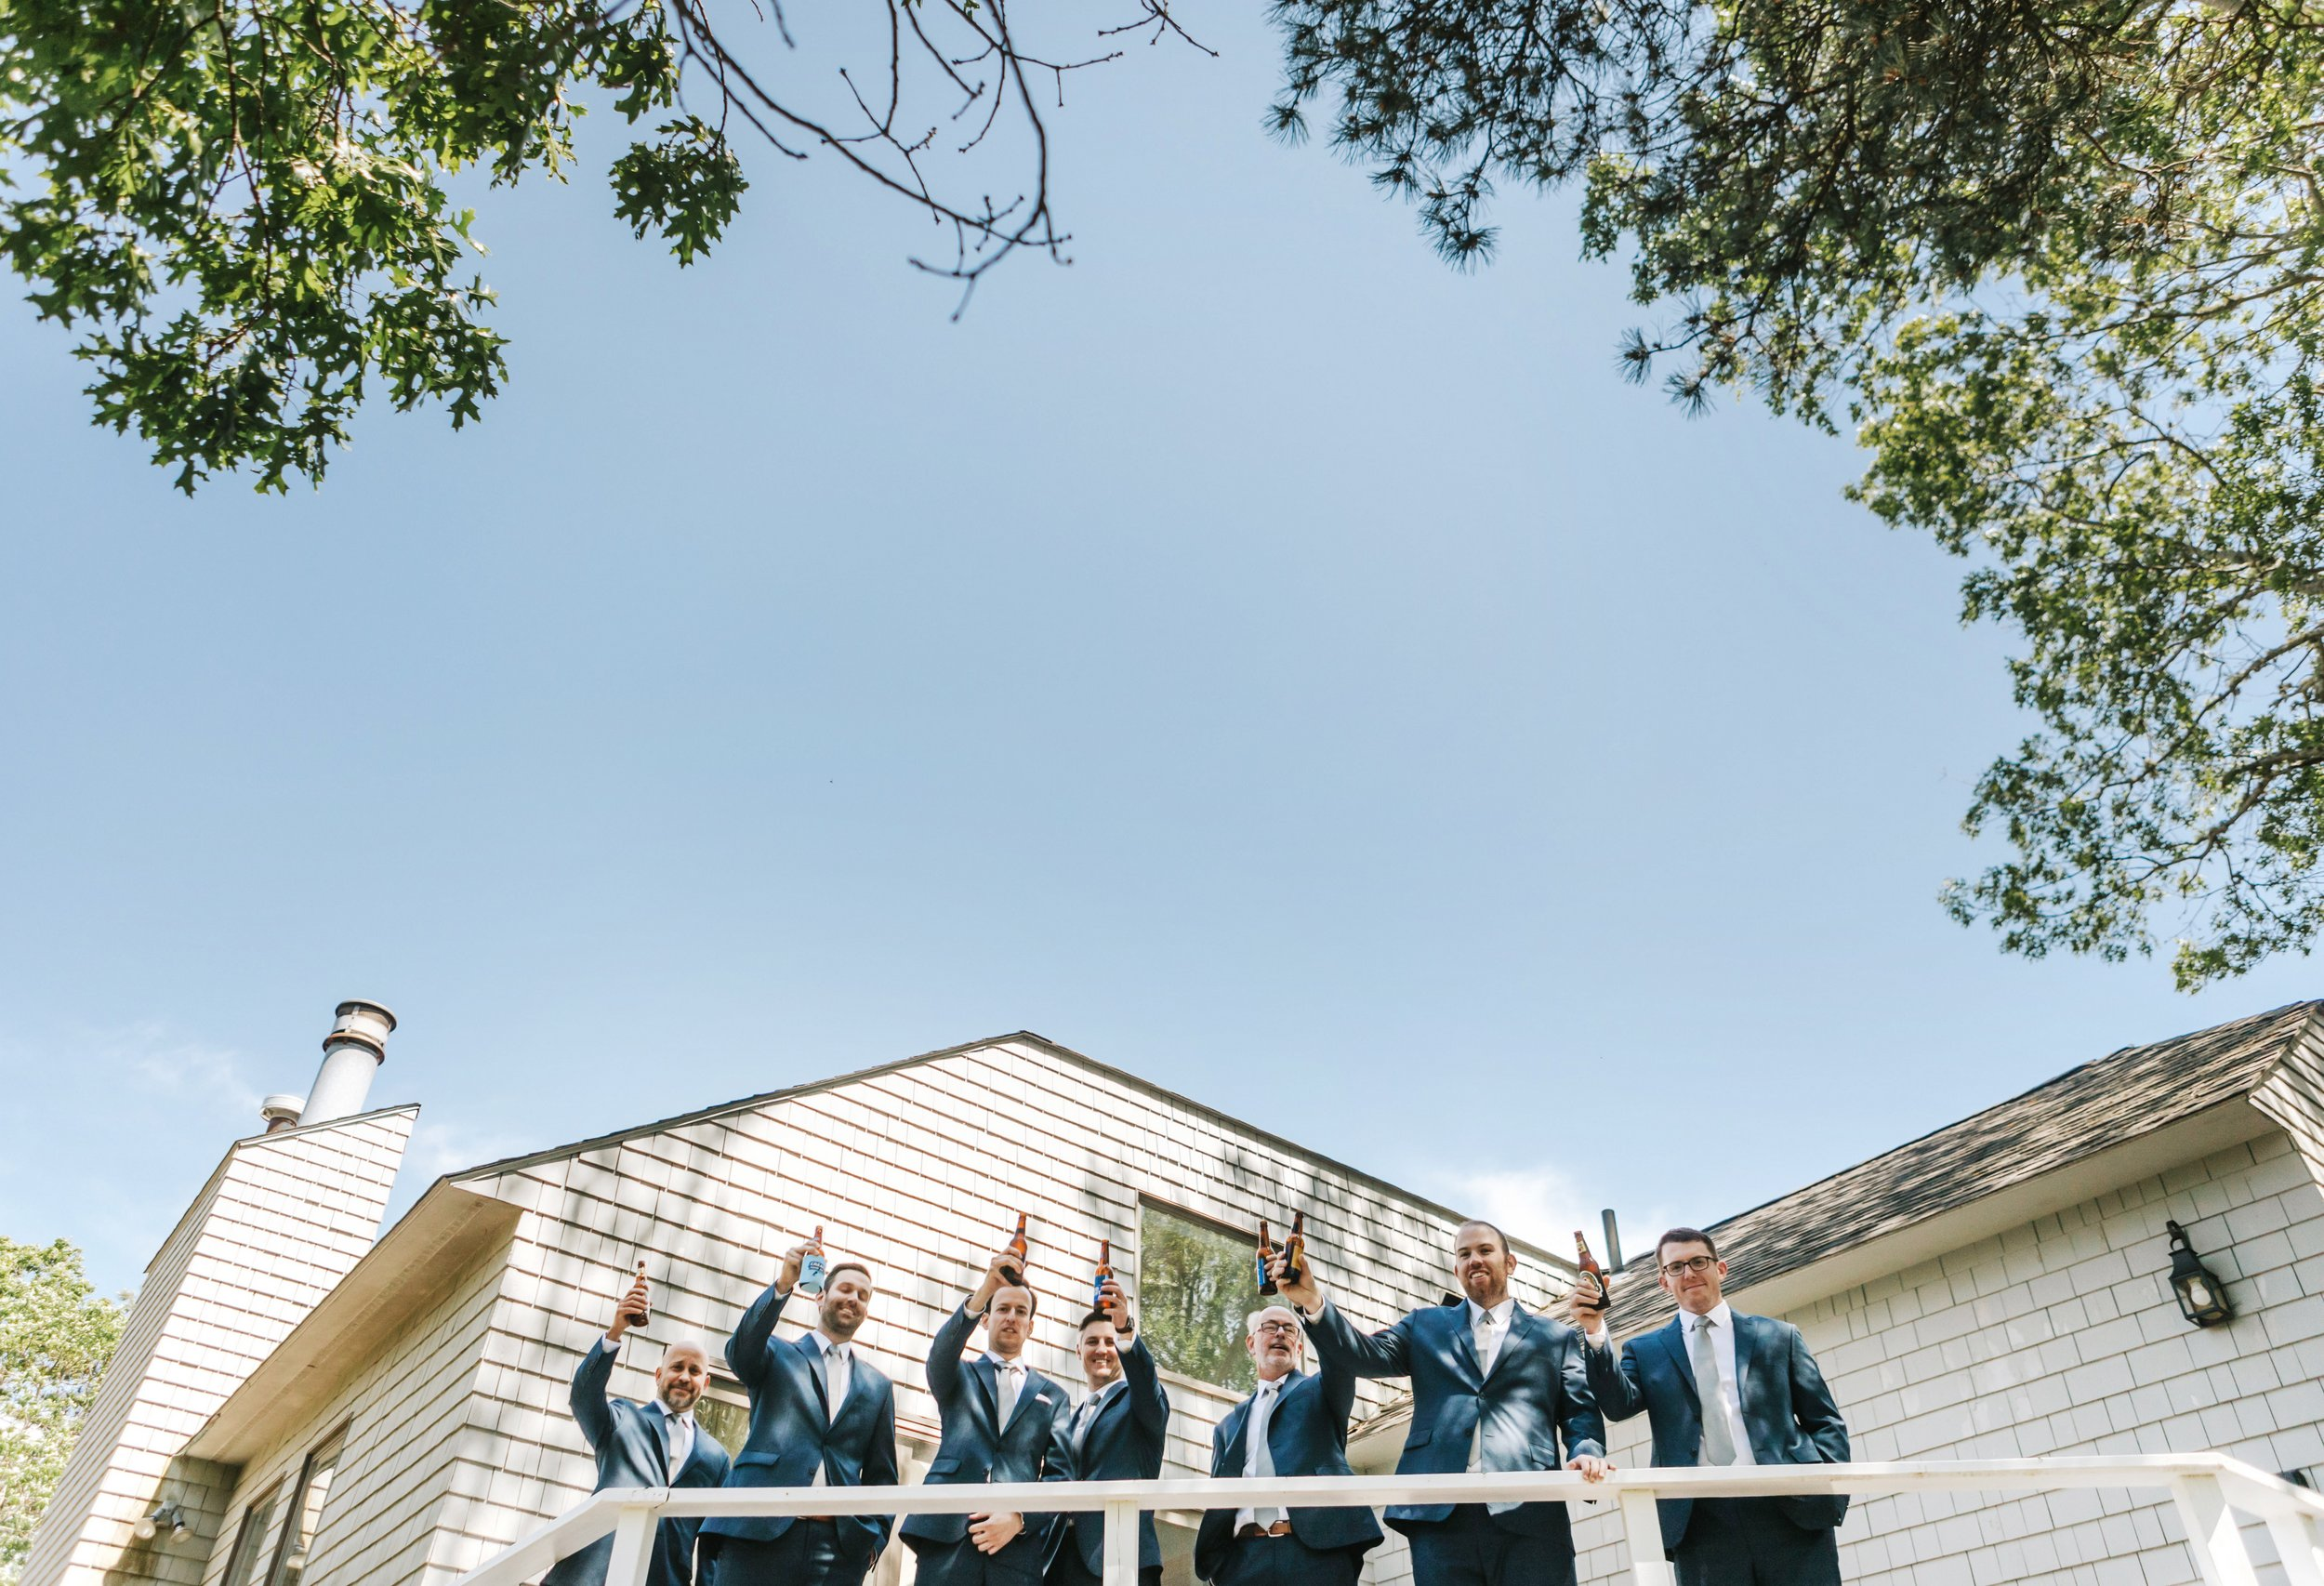 Popponesset-Inn-Wedding-Cape-Cod-Lena-Mirisola-Photography-16.jpg